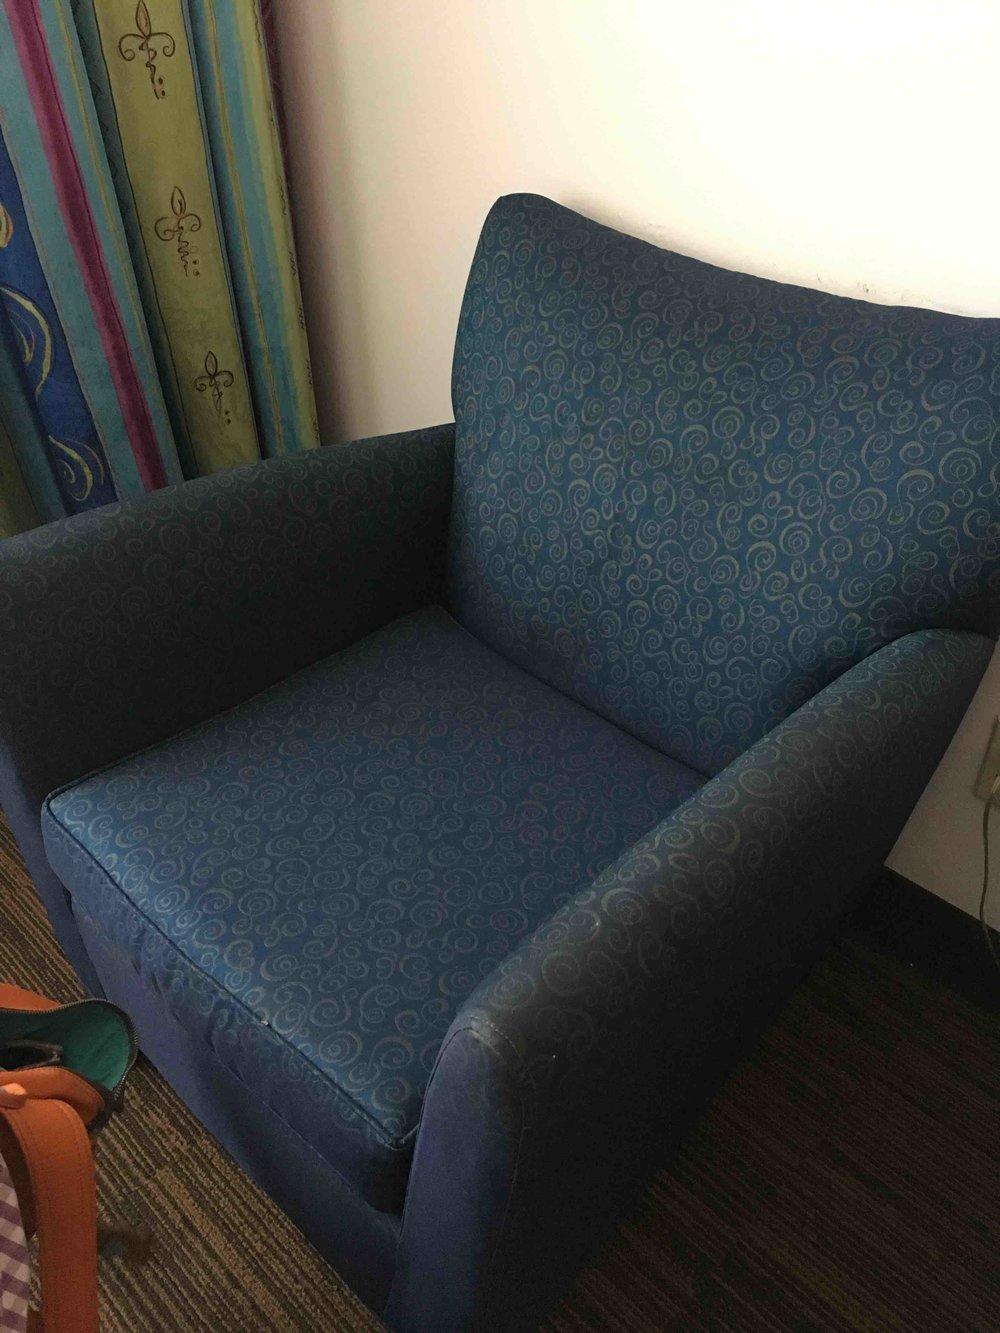 GB Armchair $38